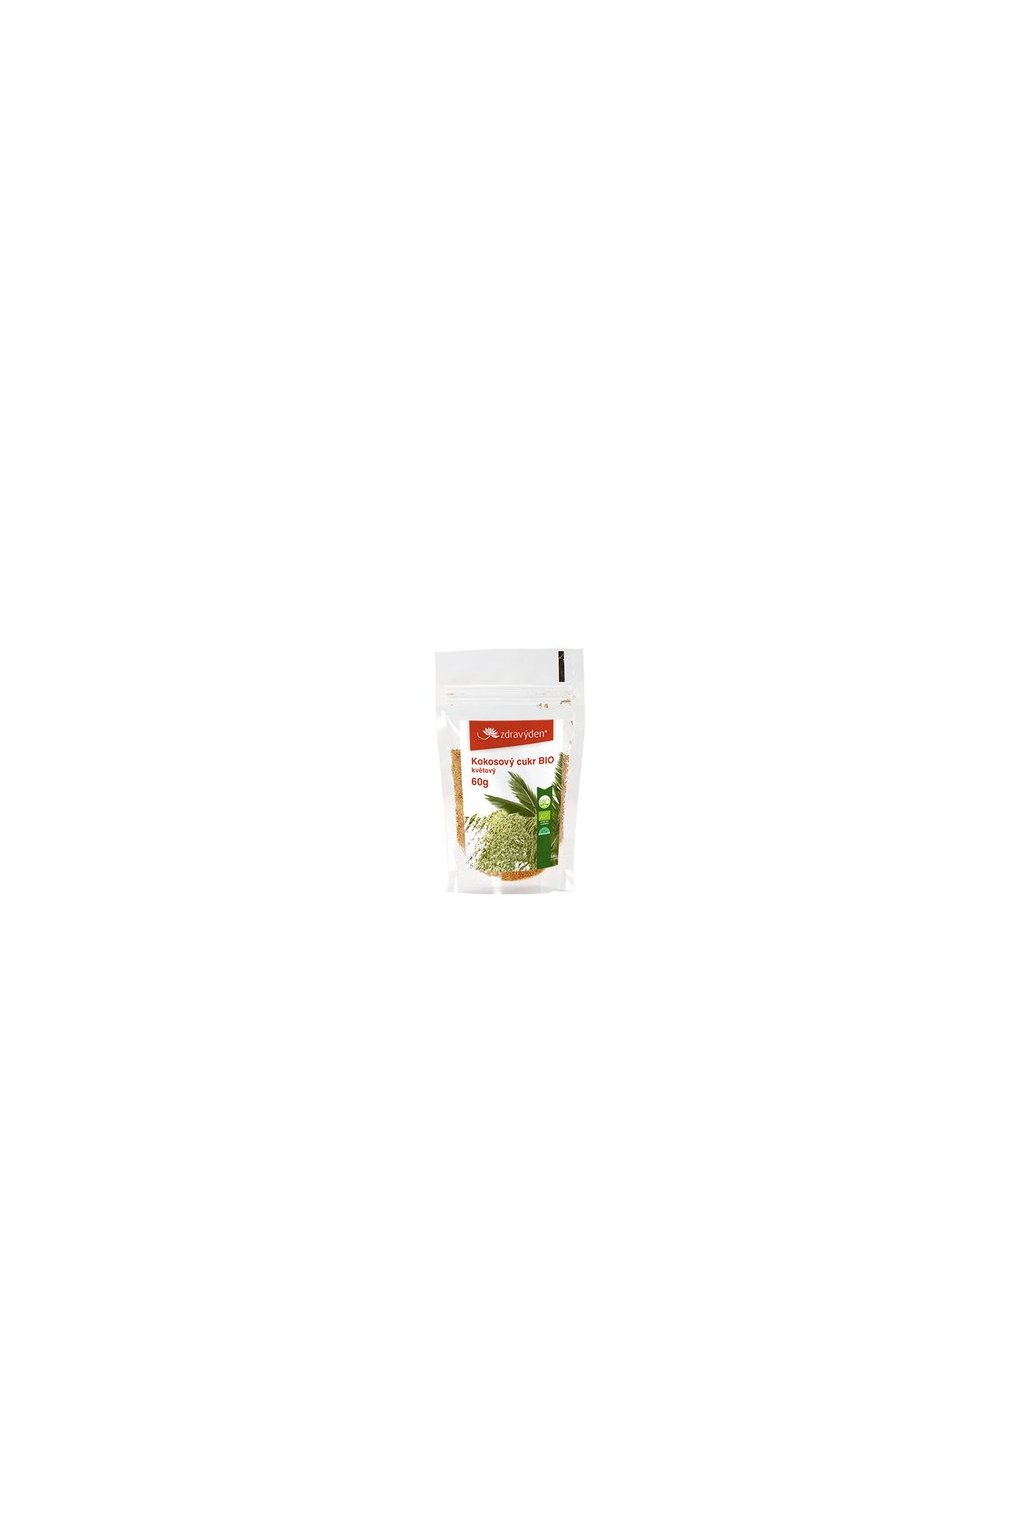 Zdravý den Kokosový cukr BIO květový (varianta 1000g)